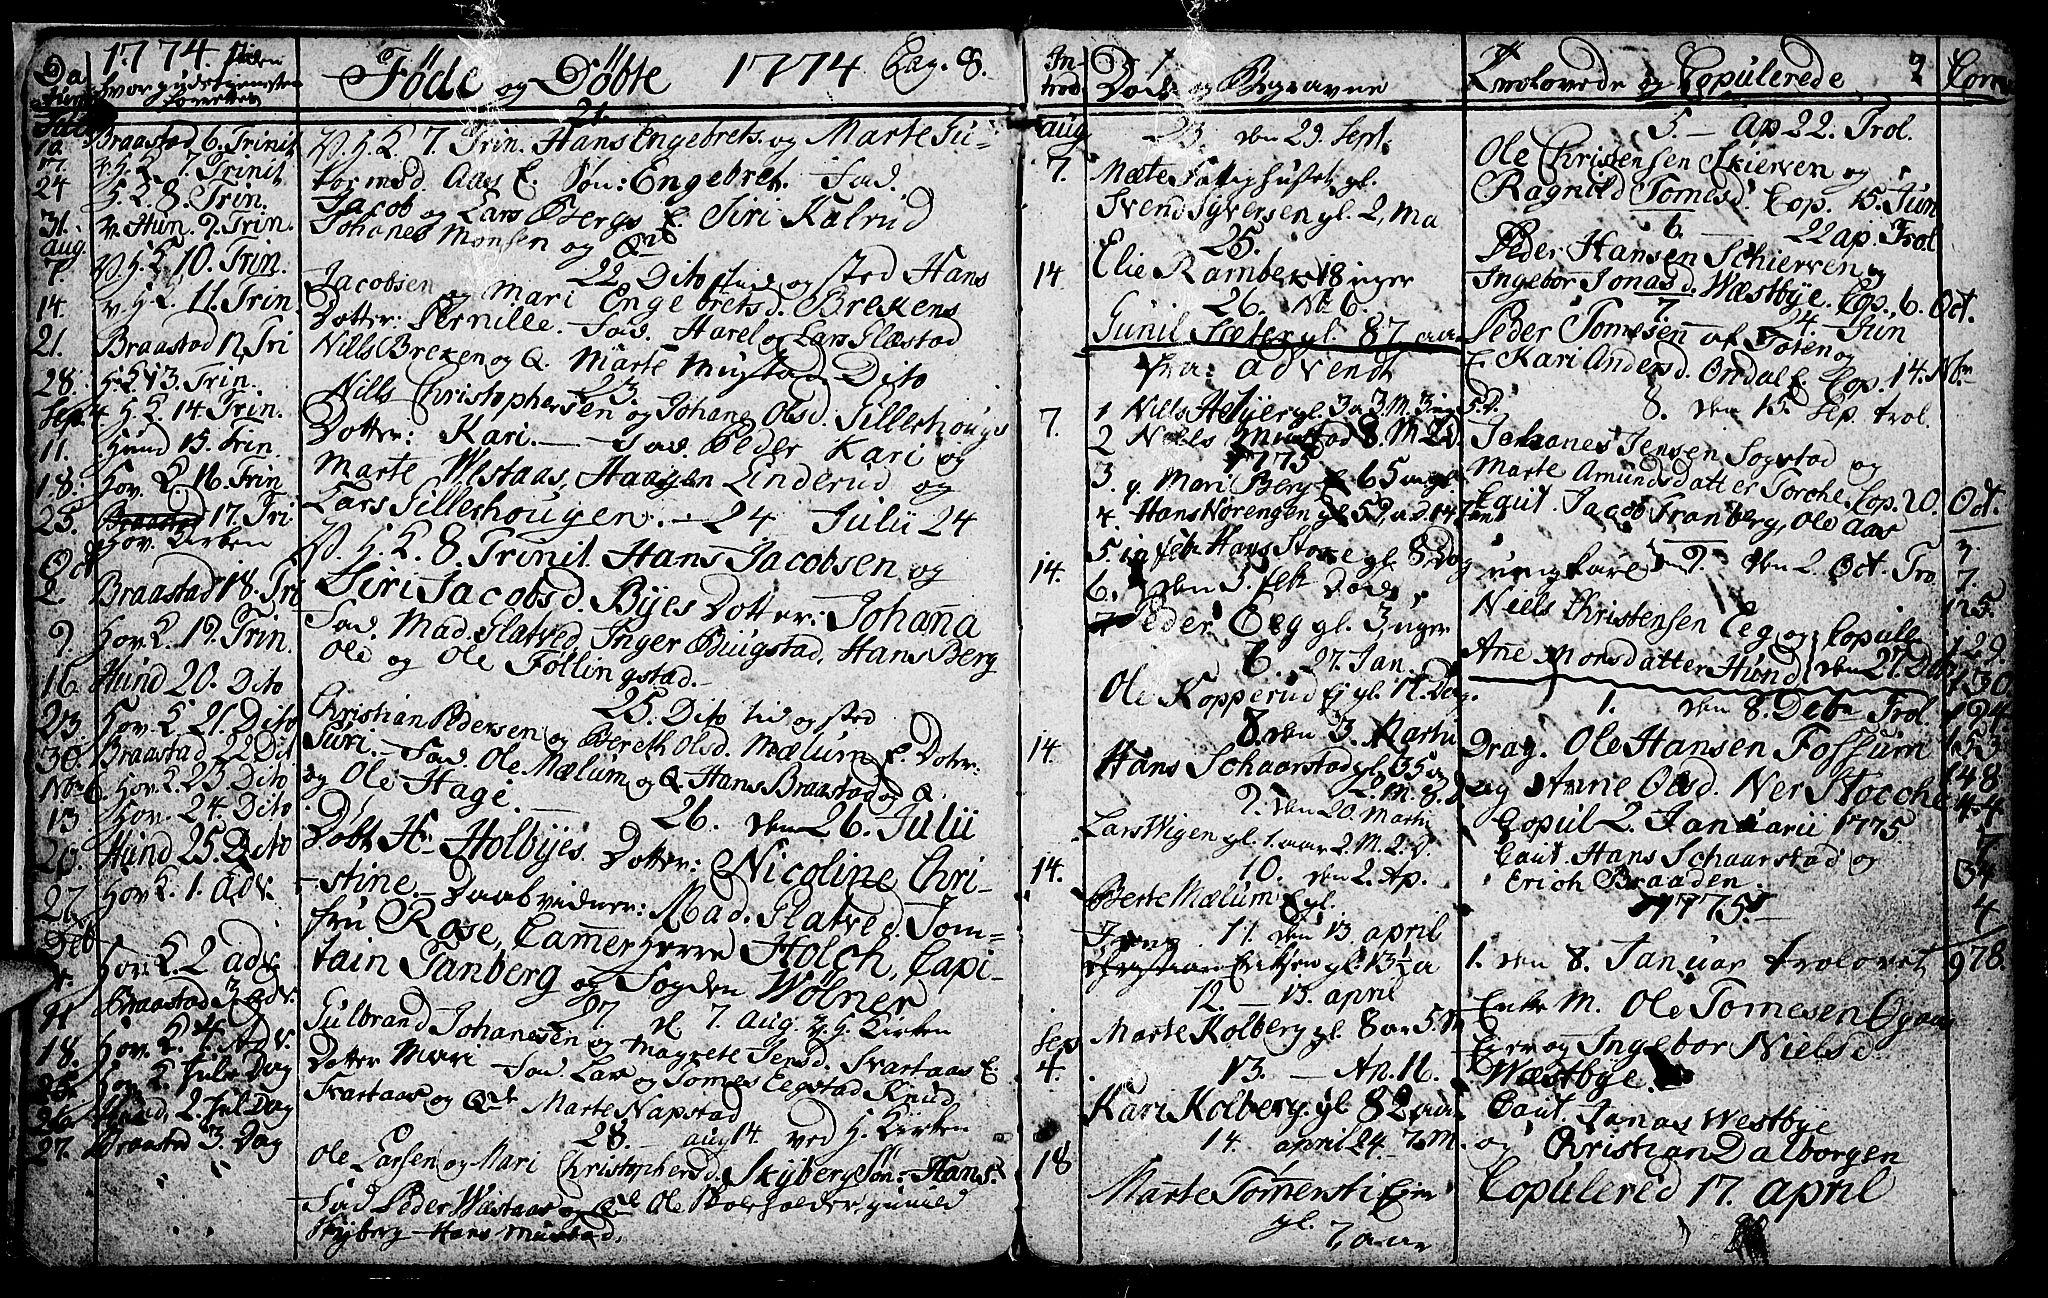 SAH, Vardal prestekontor, H/Ha/Hab/L0001: Klokkerbok nr. 1, 1771-1790, s. 8-9